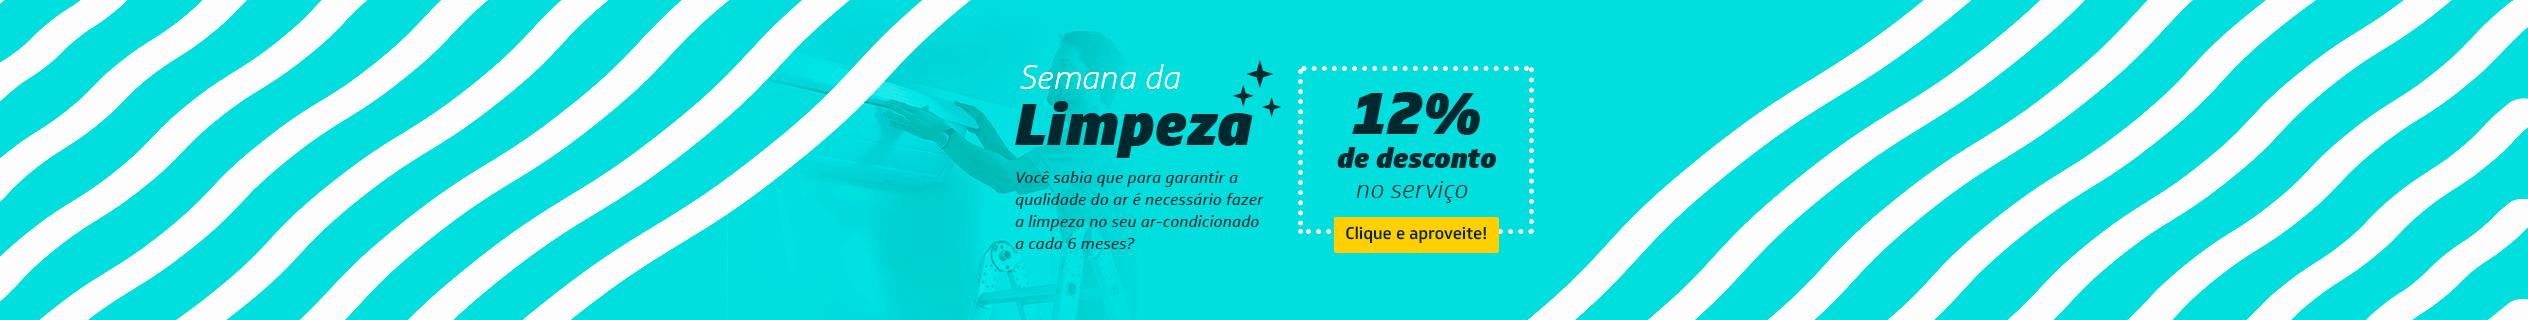 full_banner_desktop-chamada_semana_limpeza-1709-2309